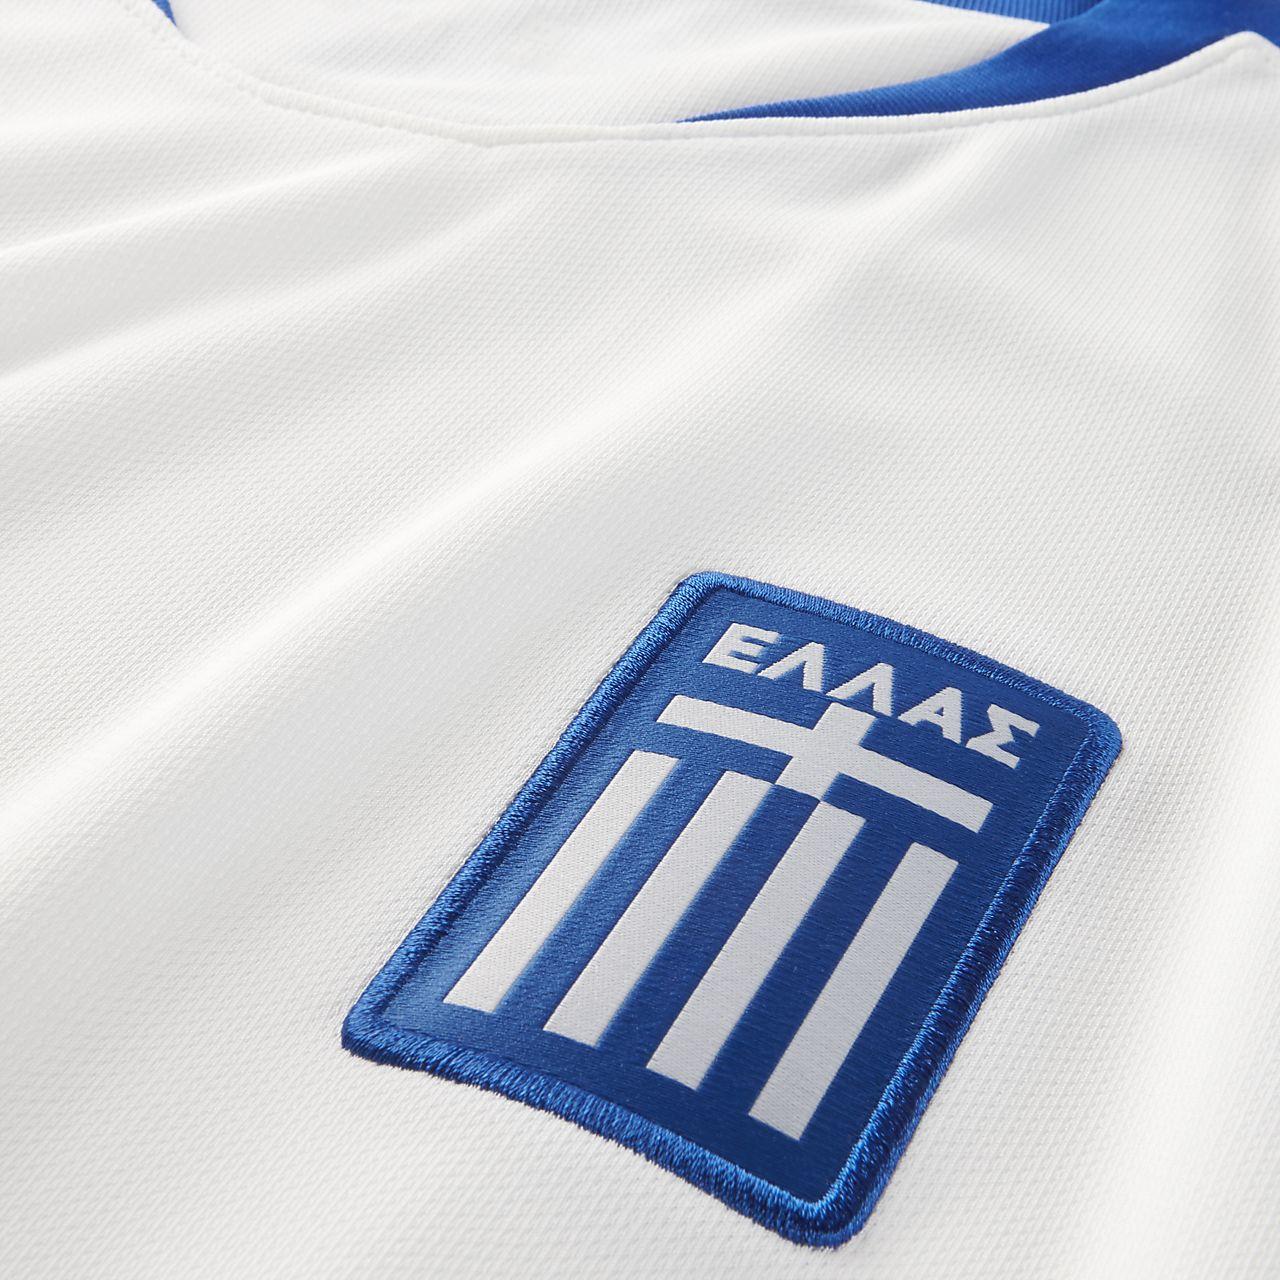 2018 Griechenland Stadium Home Herren Fußballtrikot